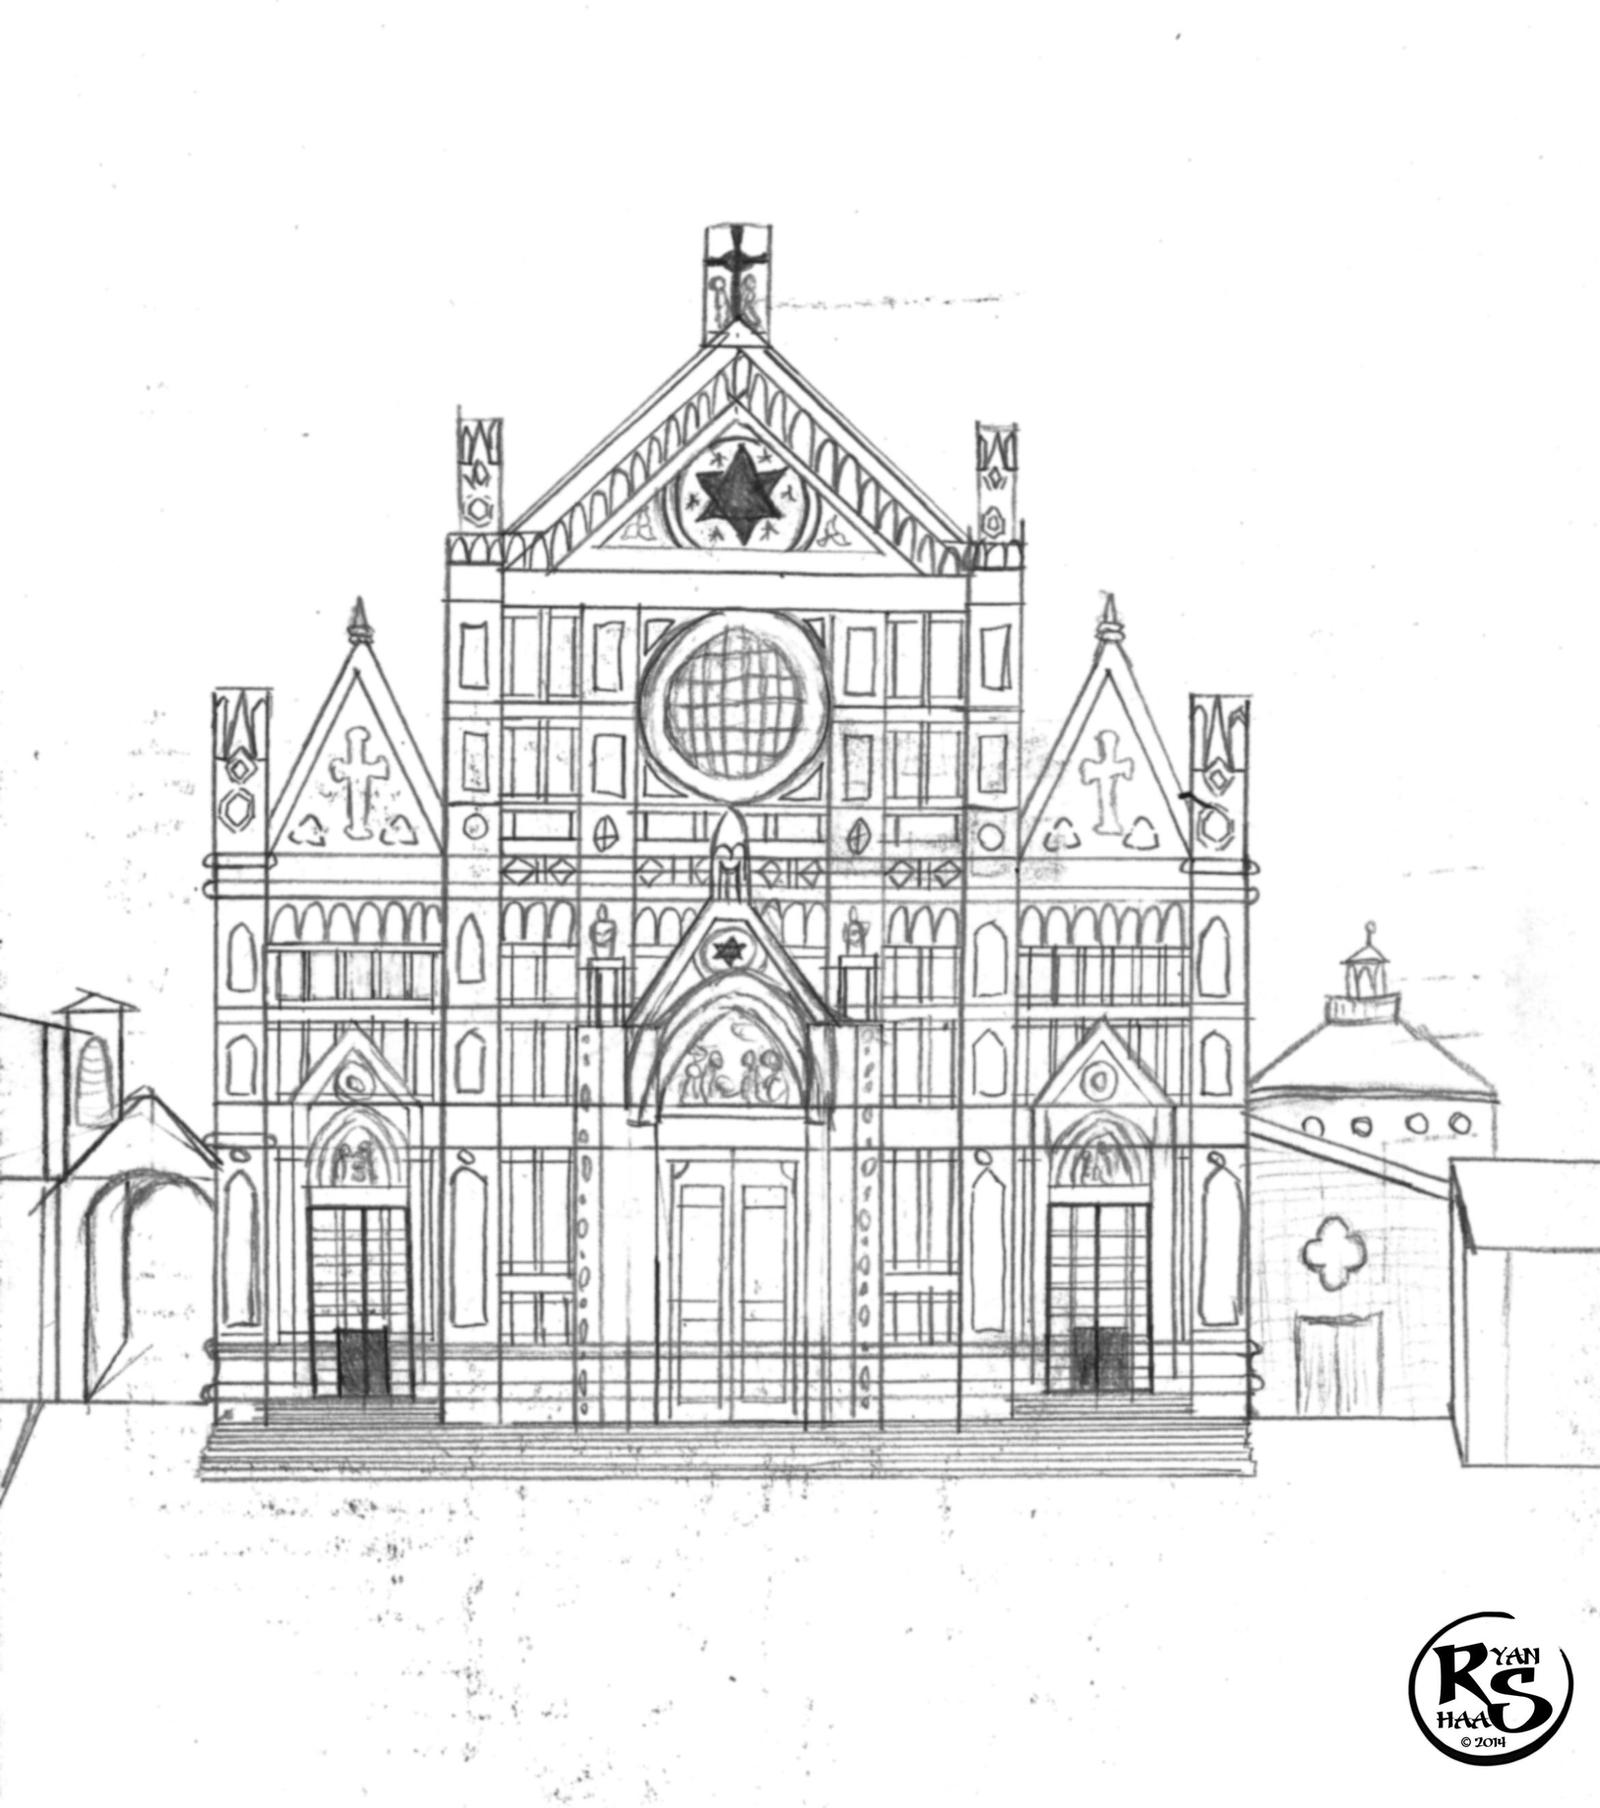 basilica of santa croce florence by ryanhaas on deviantart